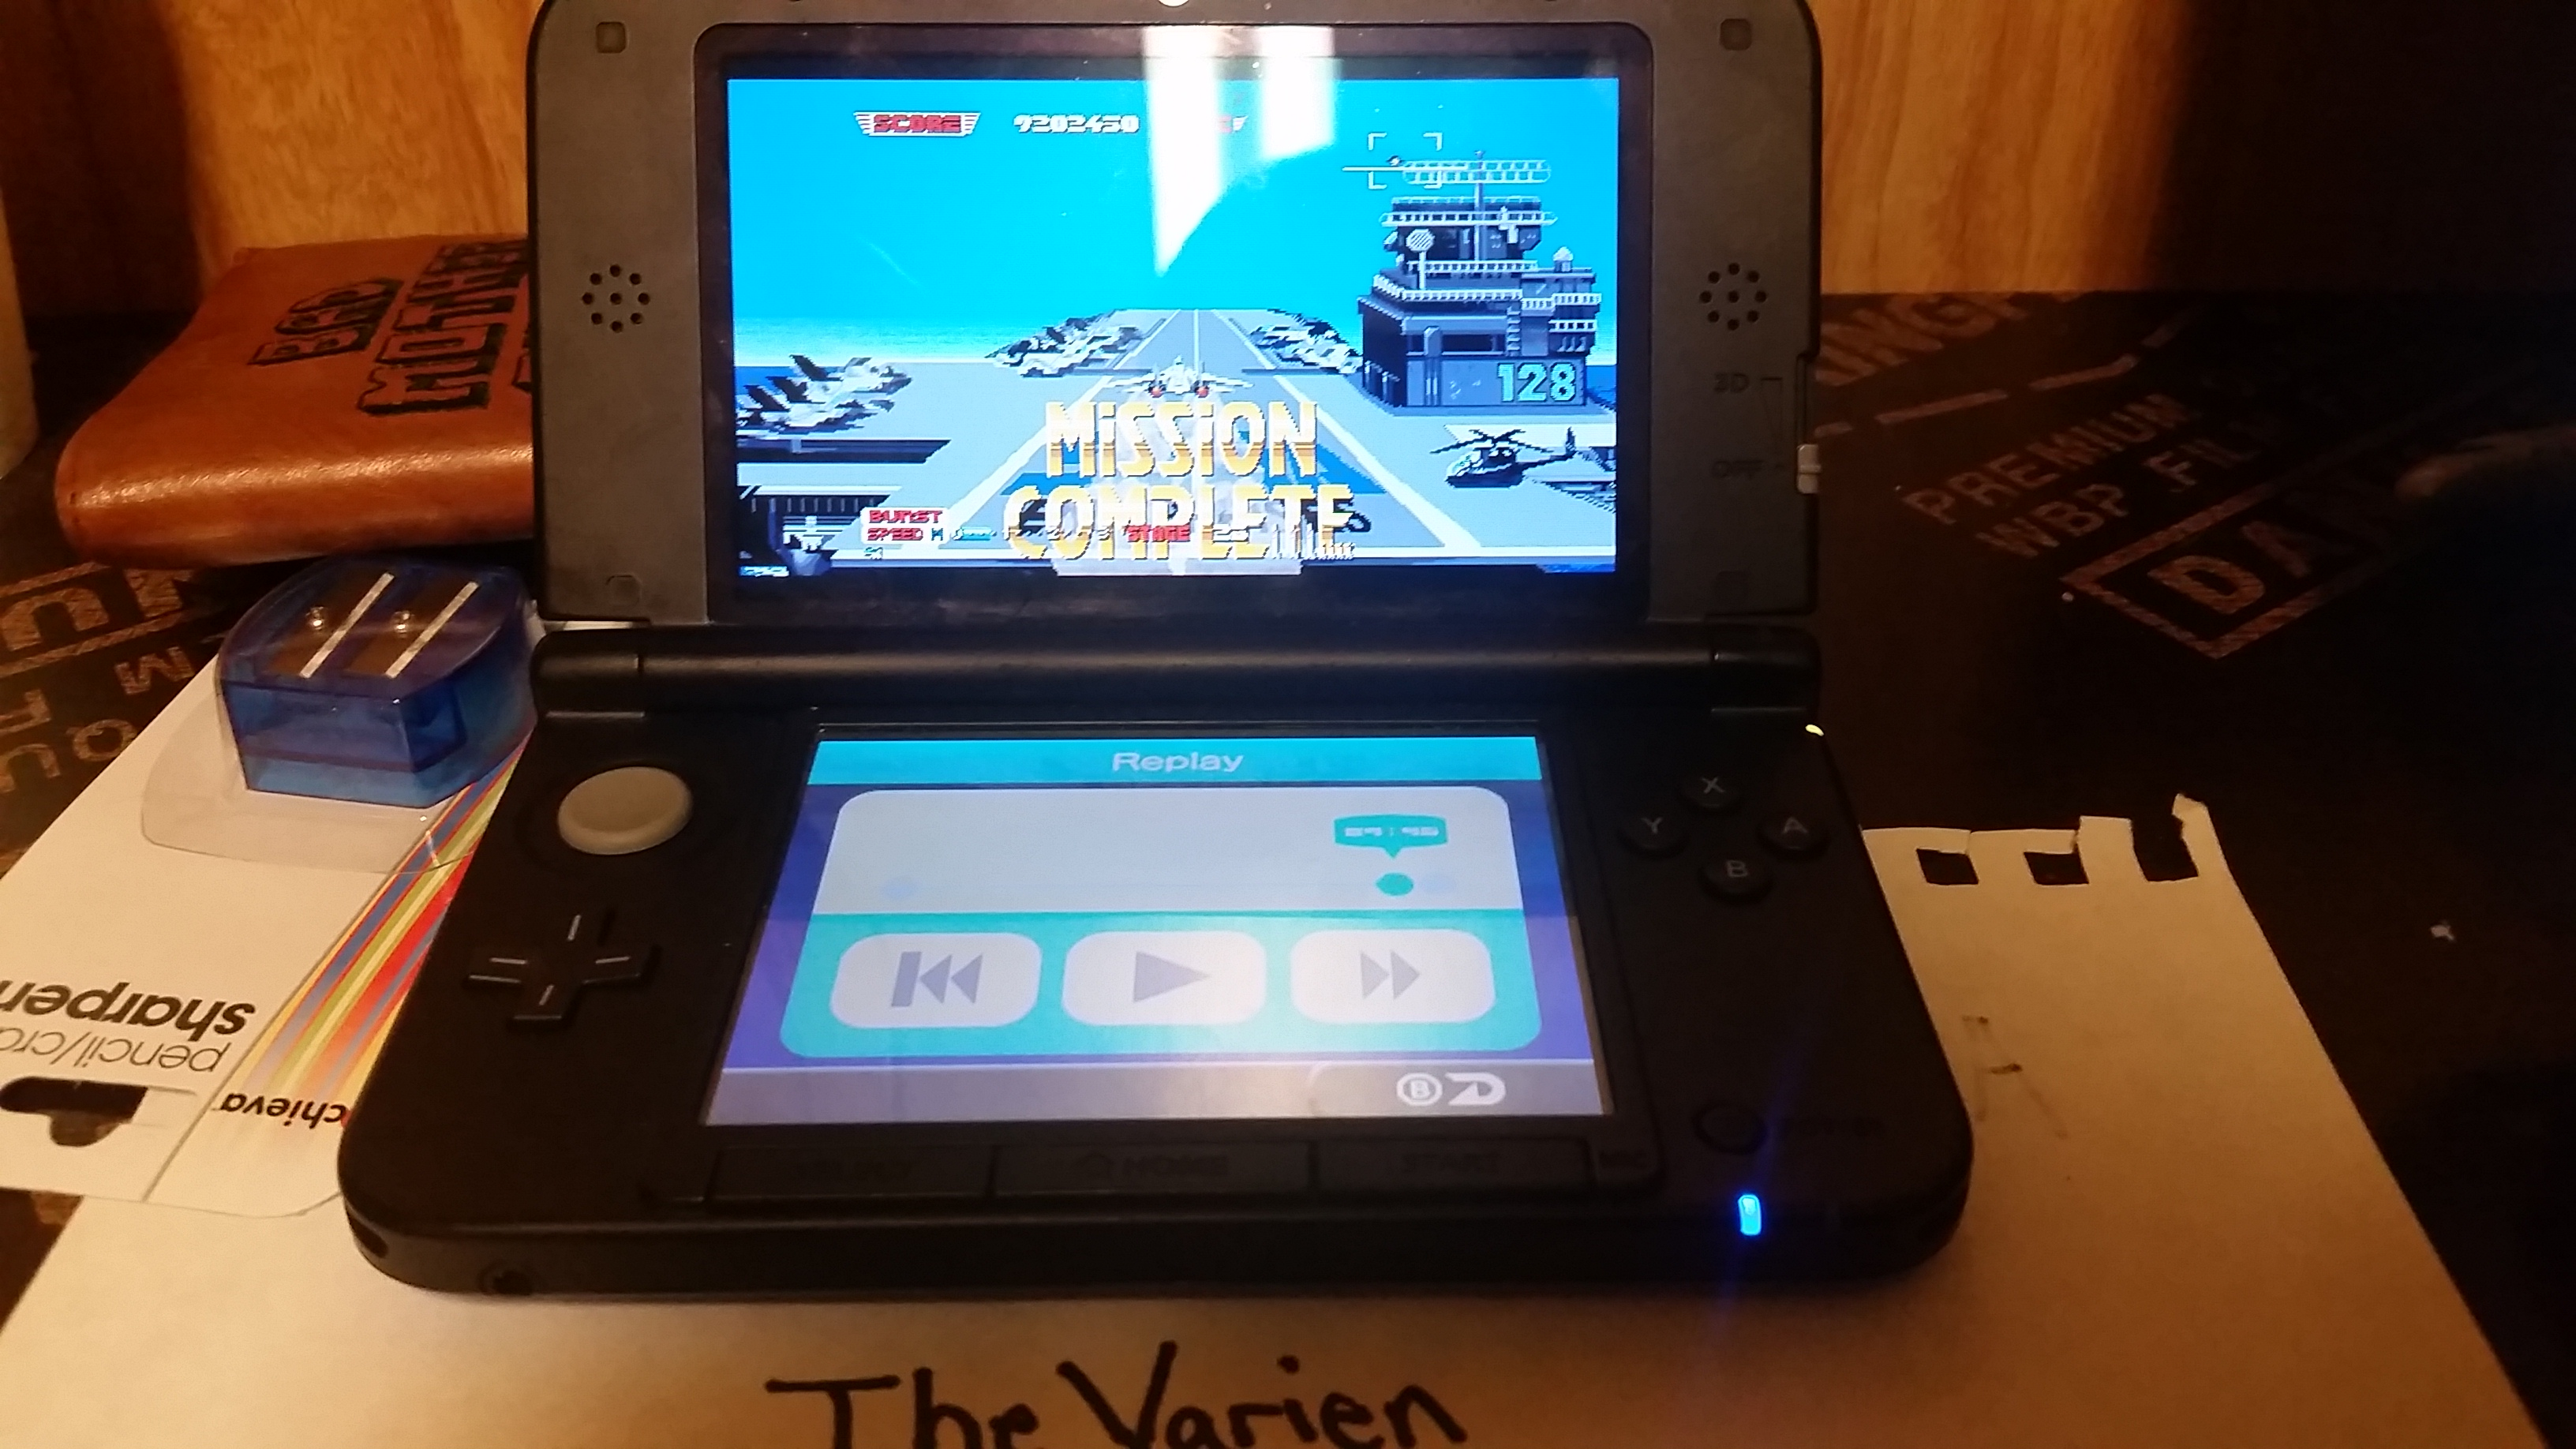 TheVarien: After Burner II 3D: Special (Nintendo 3DS) 9,202,450 points on 2015-01-21 16:06:17